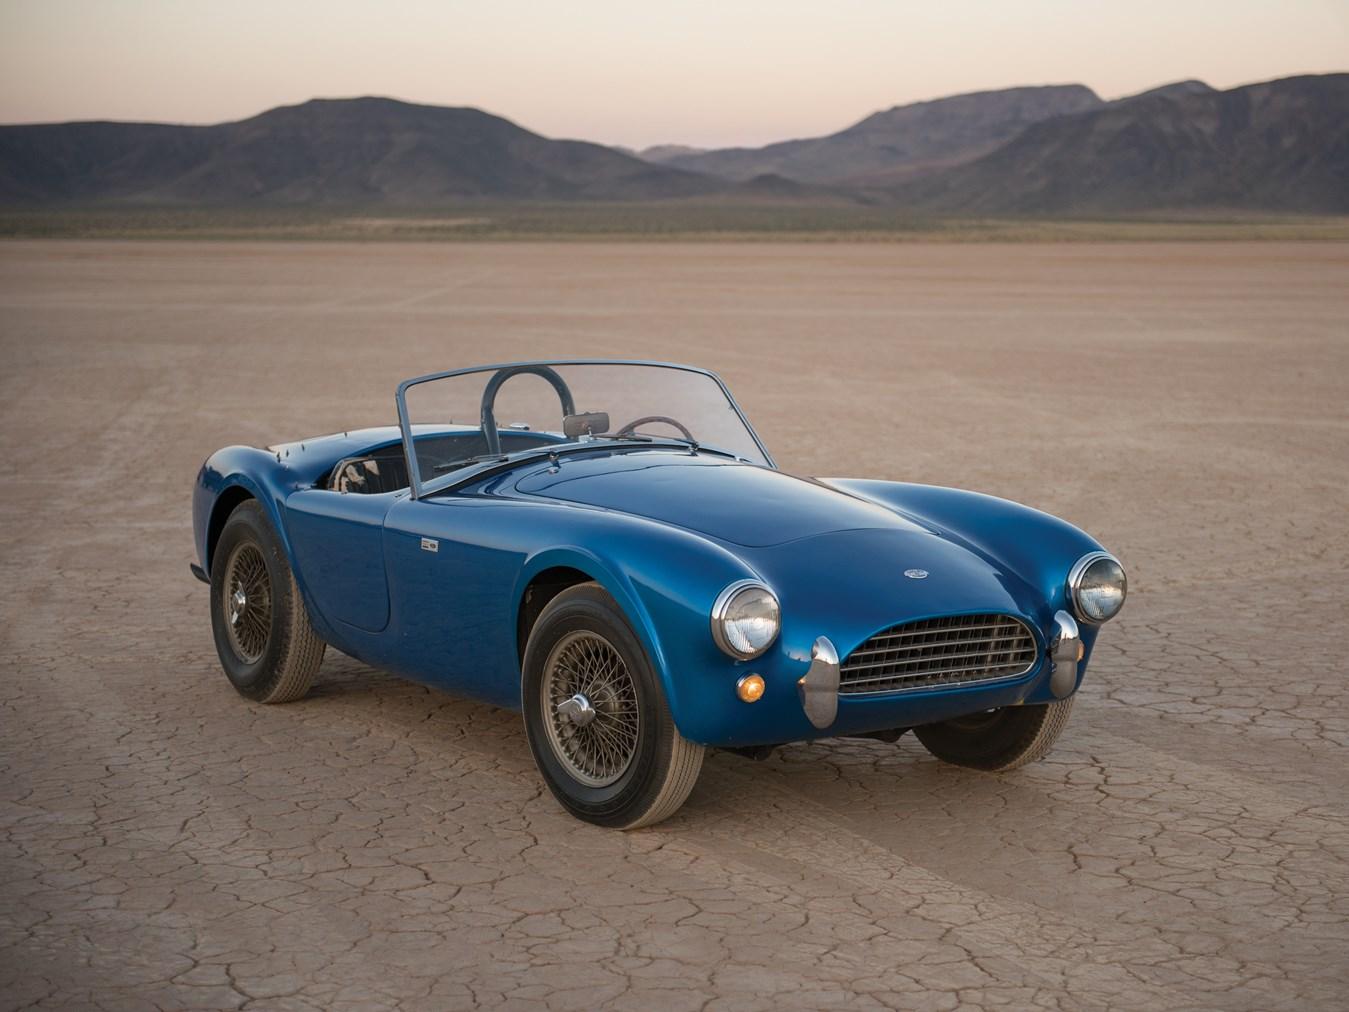 Первый экземпляр Shelby Cobra продадут на аукционе